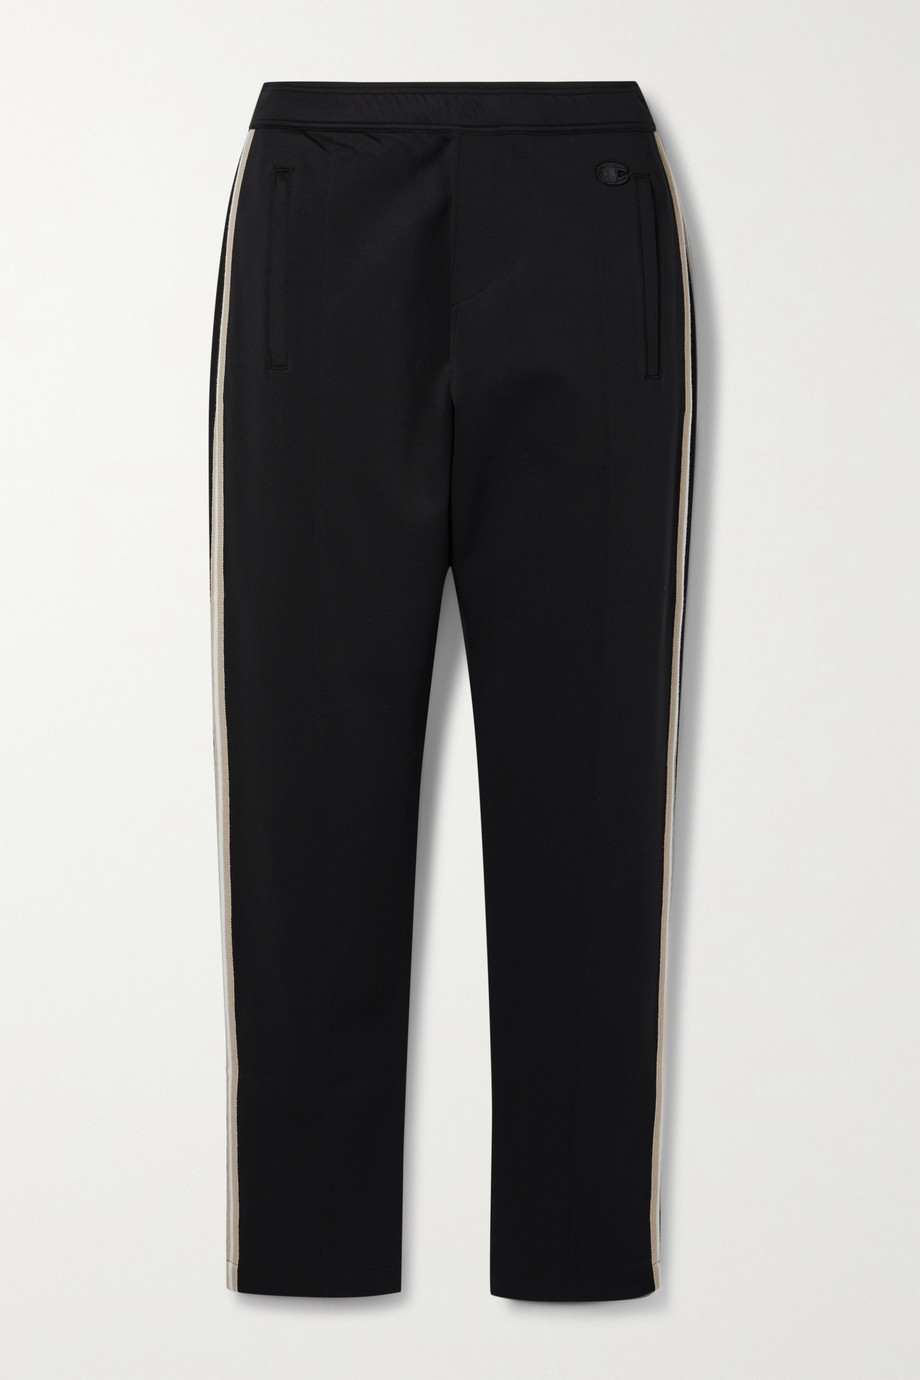 Nili Lotan + Champion appliquéd striped stretch-jersey track pants